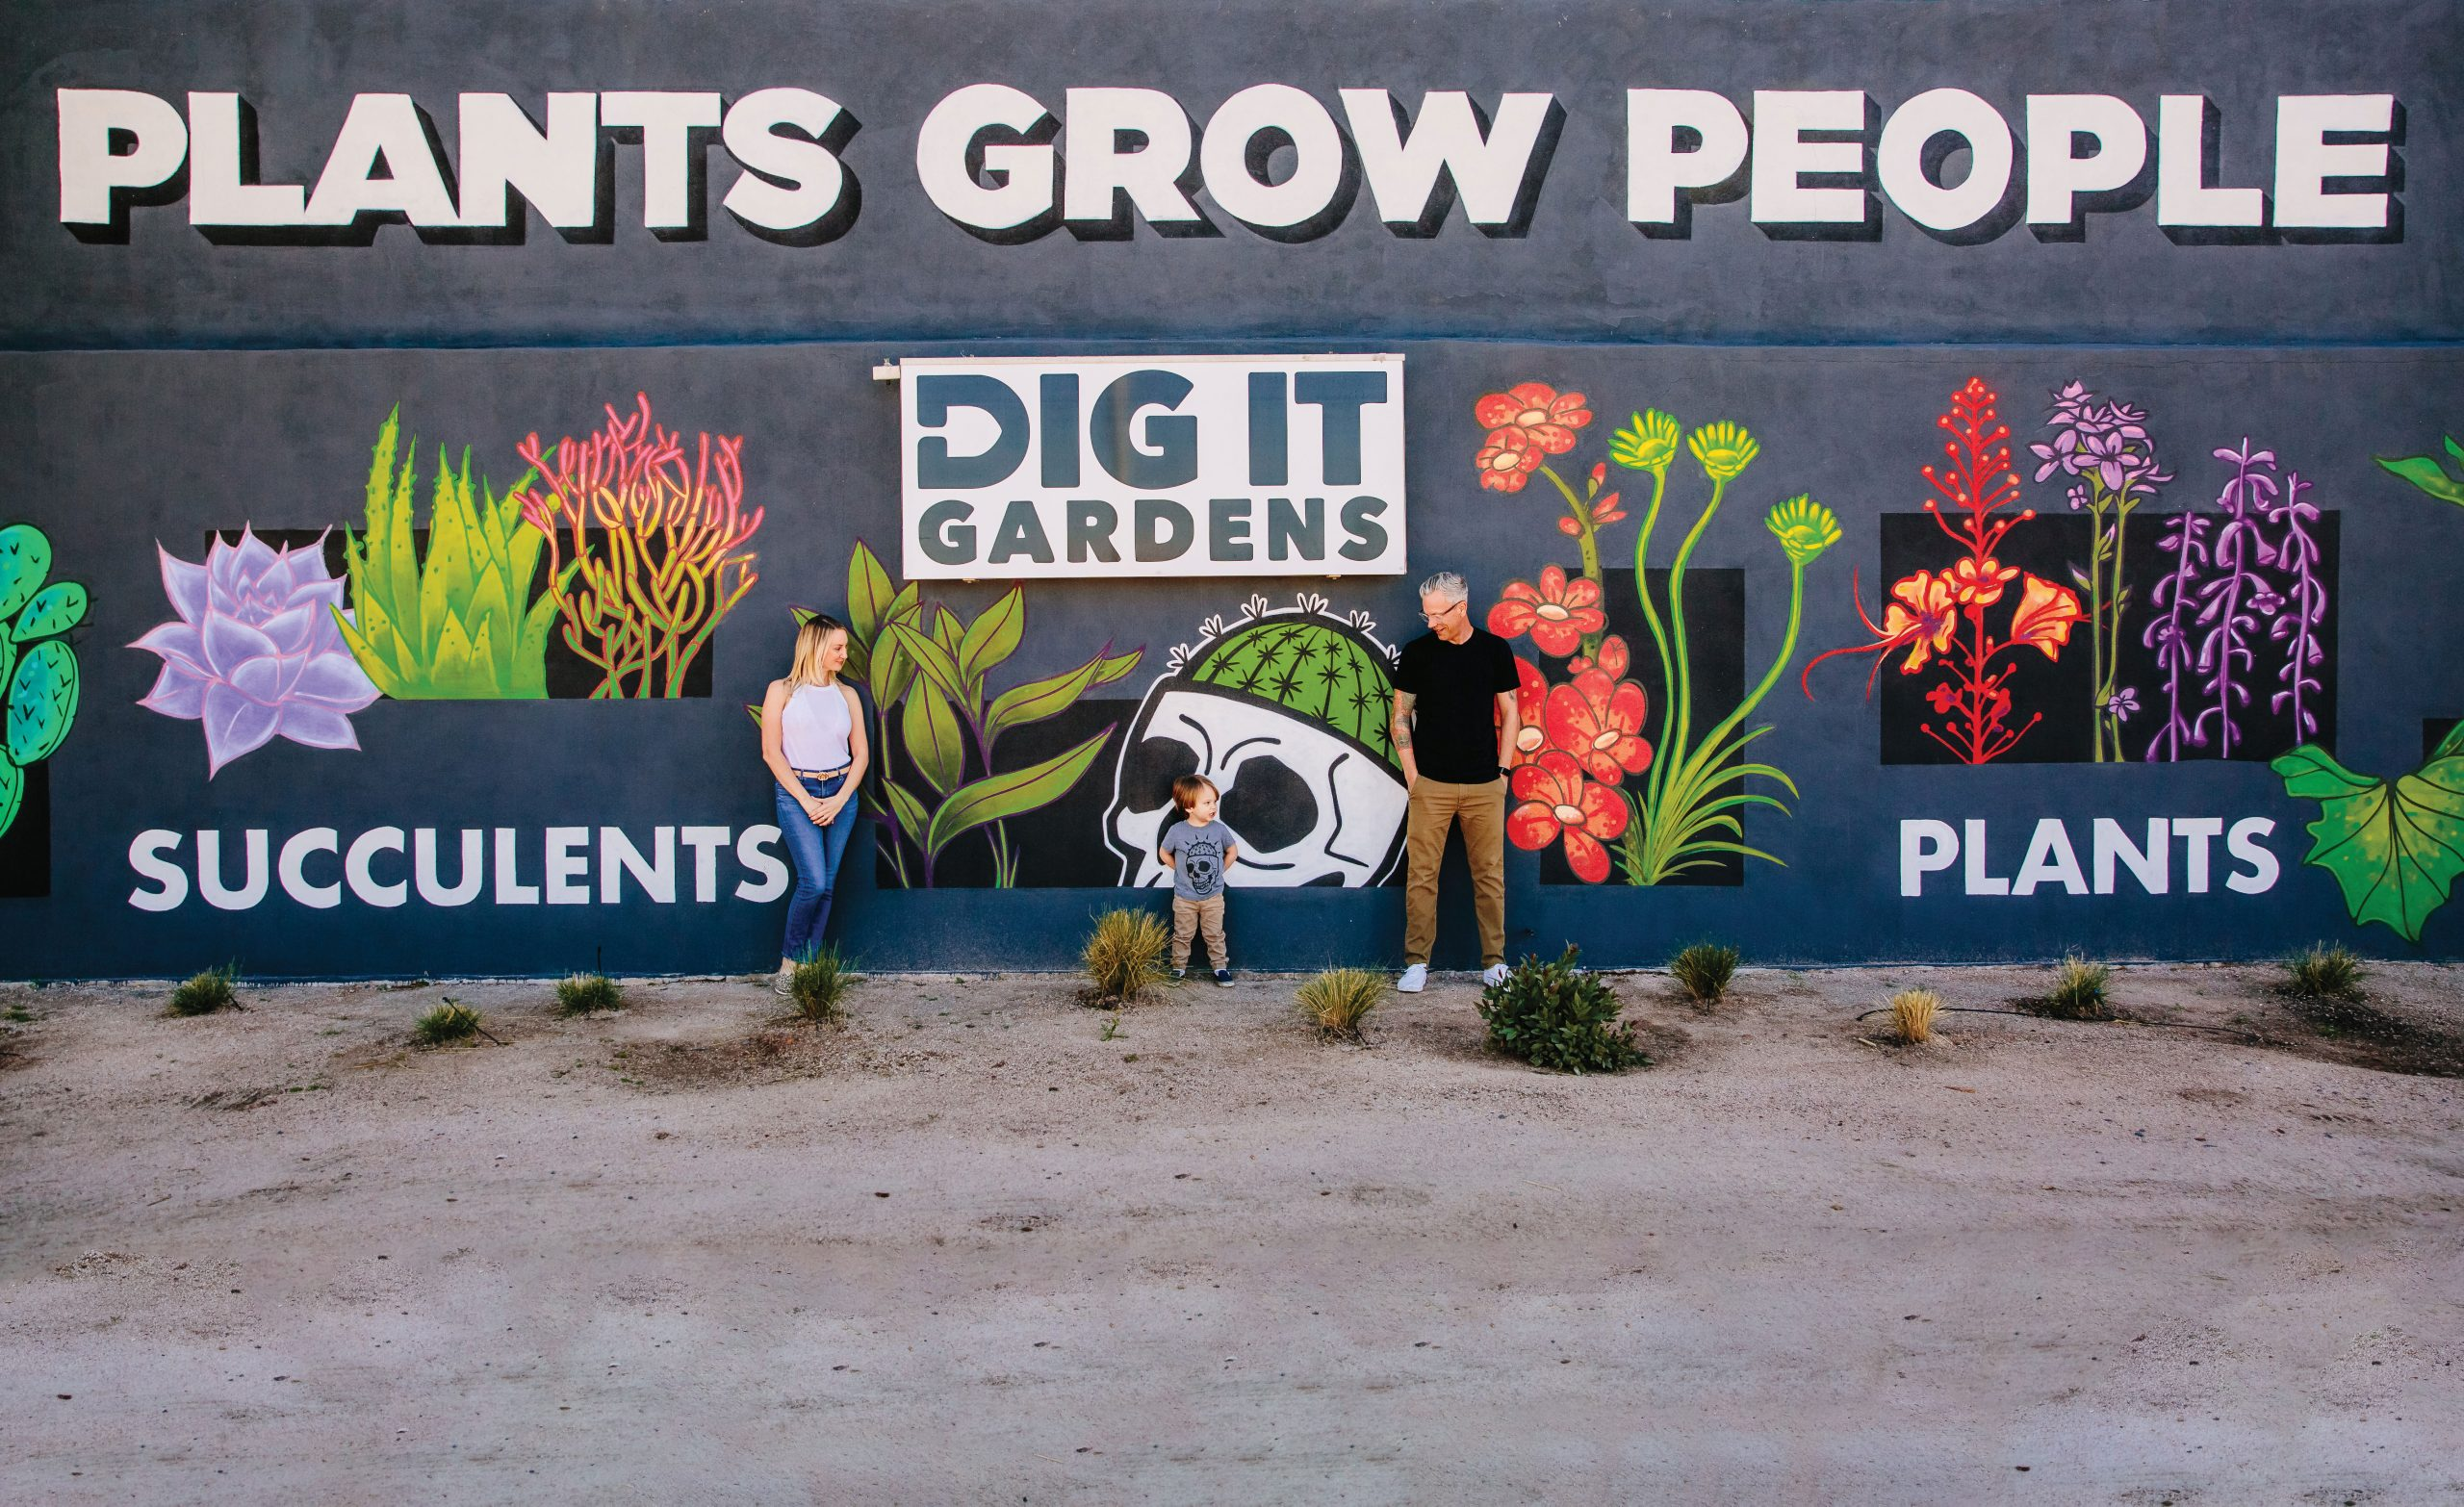 Photo courtesy Dig It Gardens